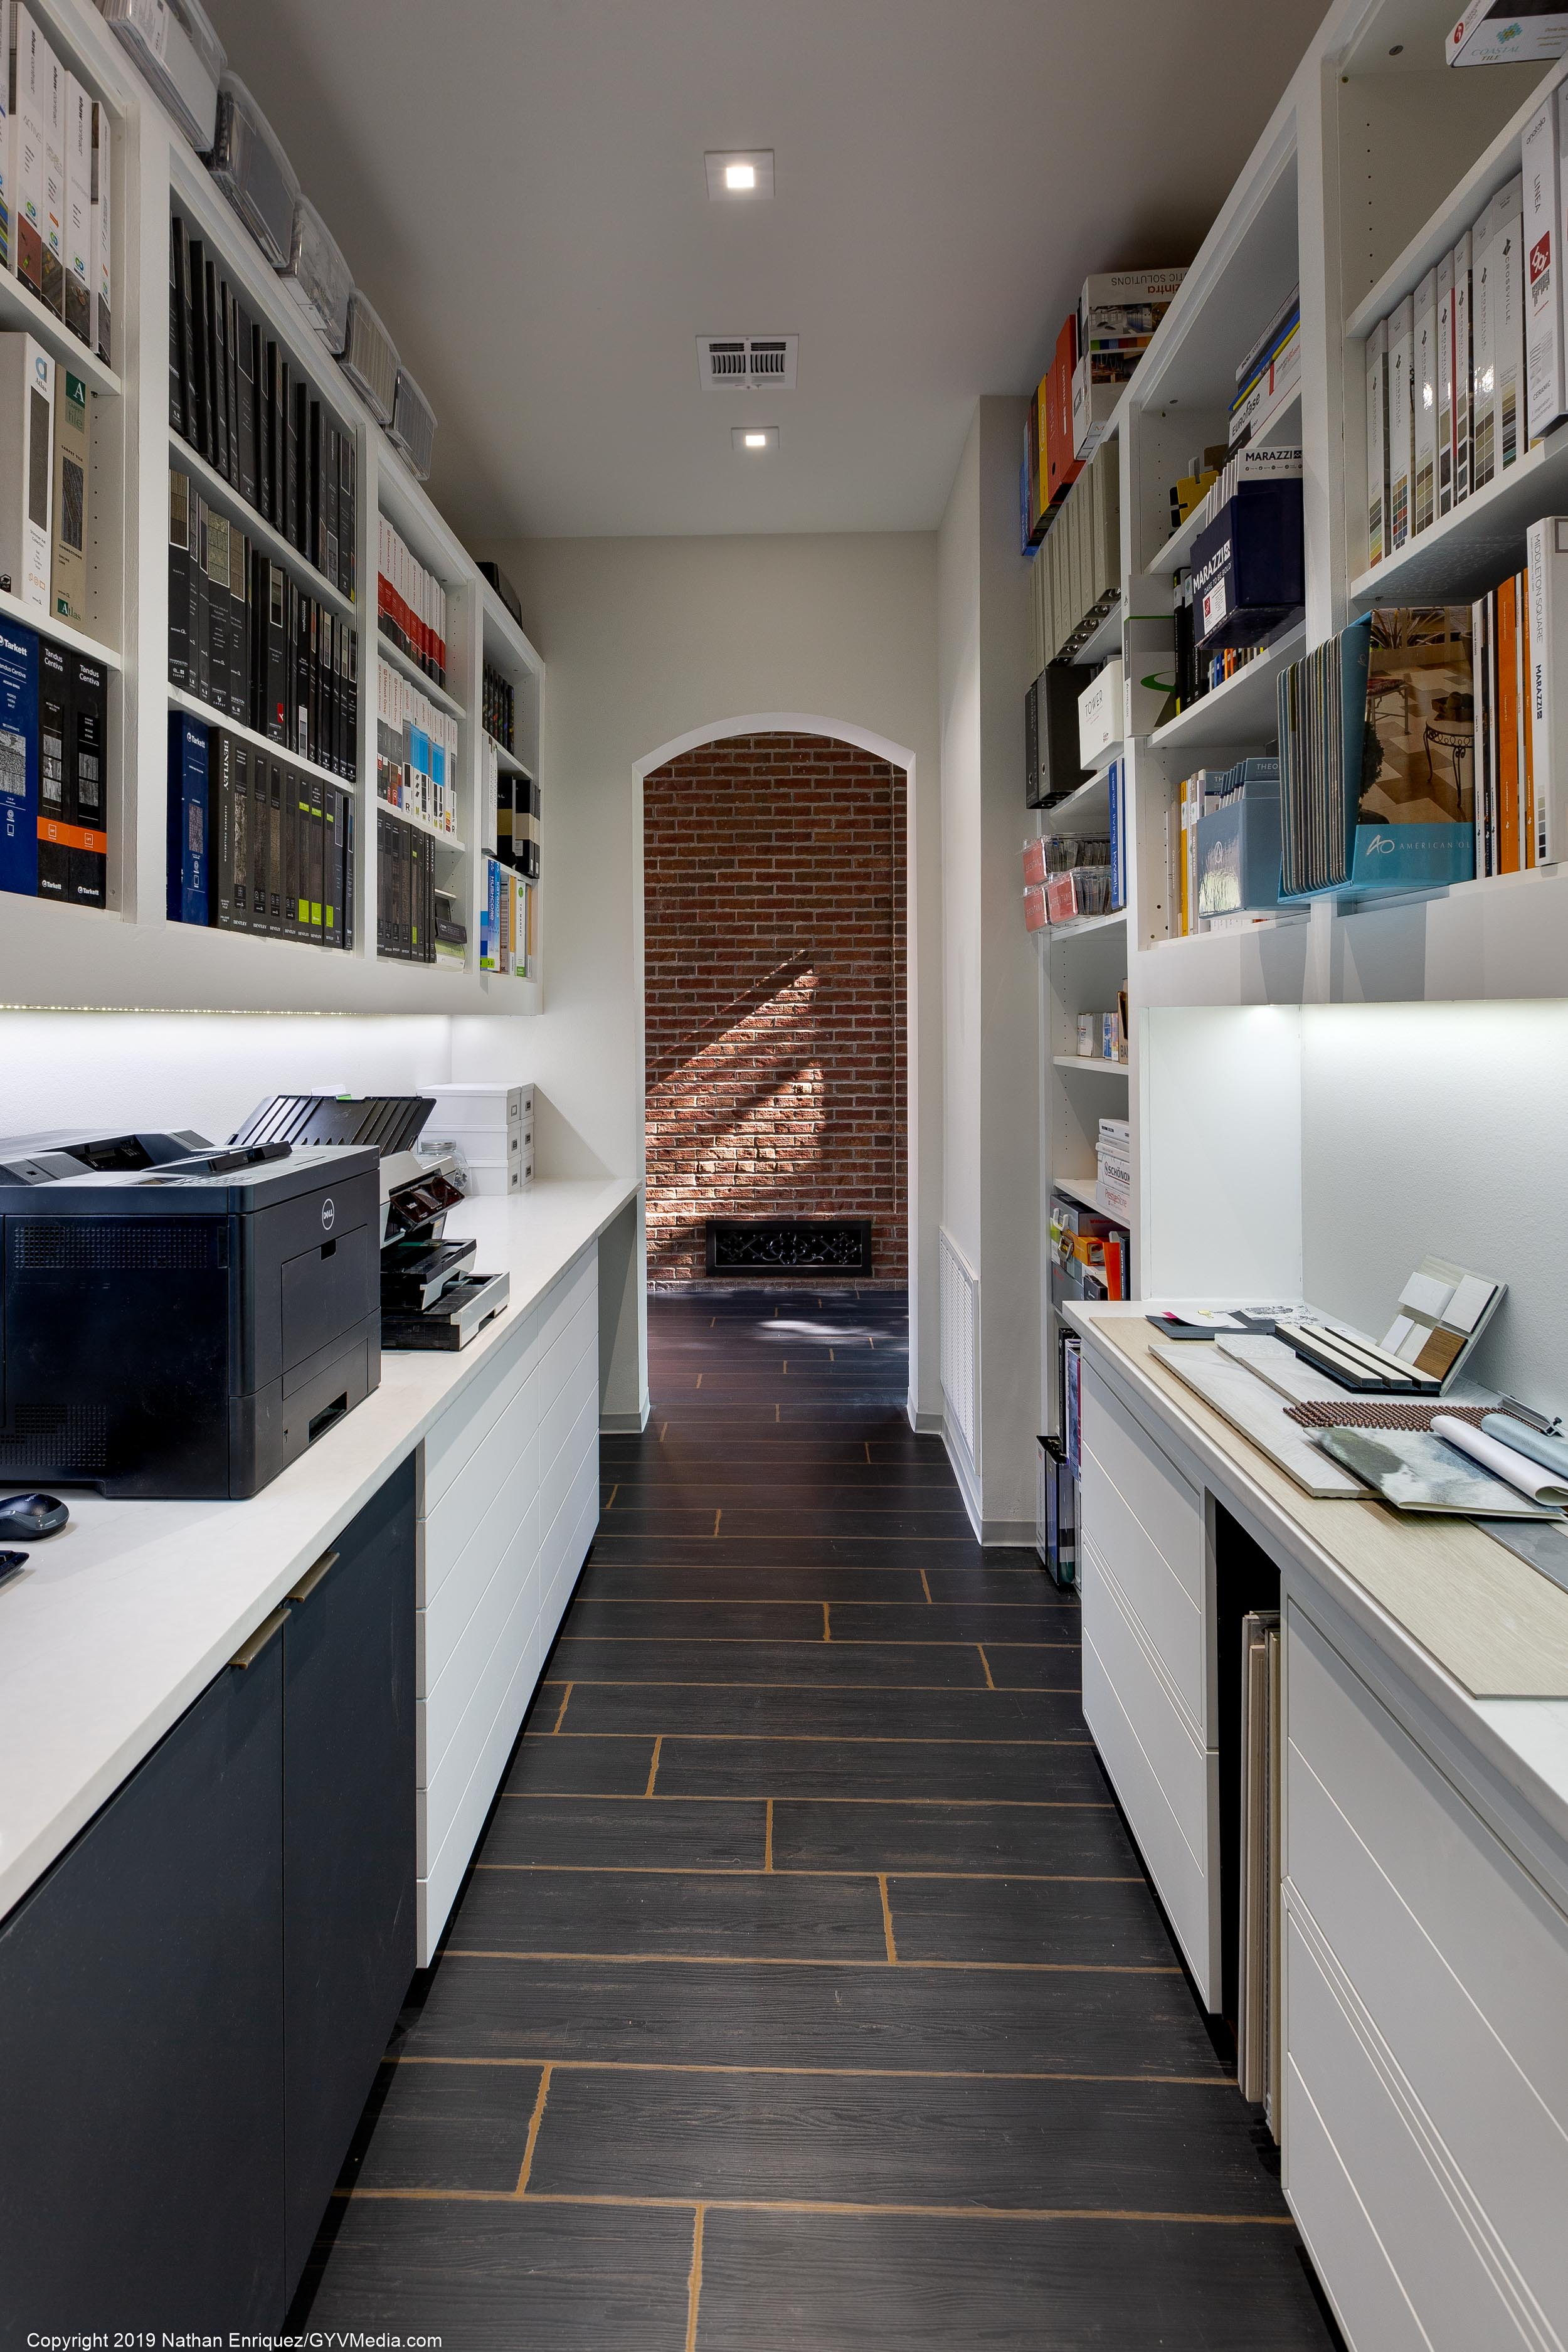 Greenleaf Lawson Architects Covington (JPEG Web Res) (9 of 9).jpg